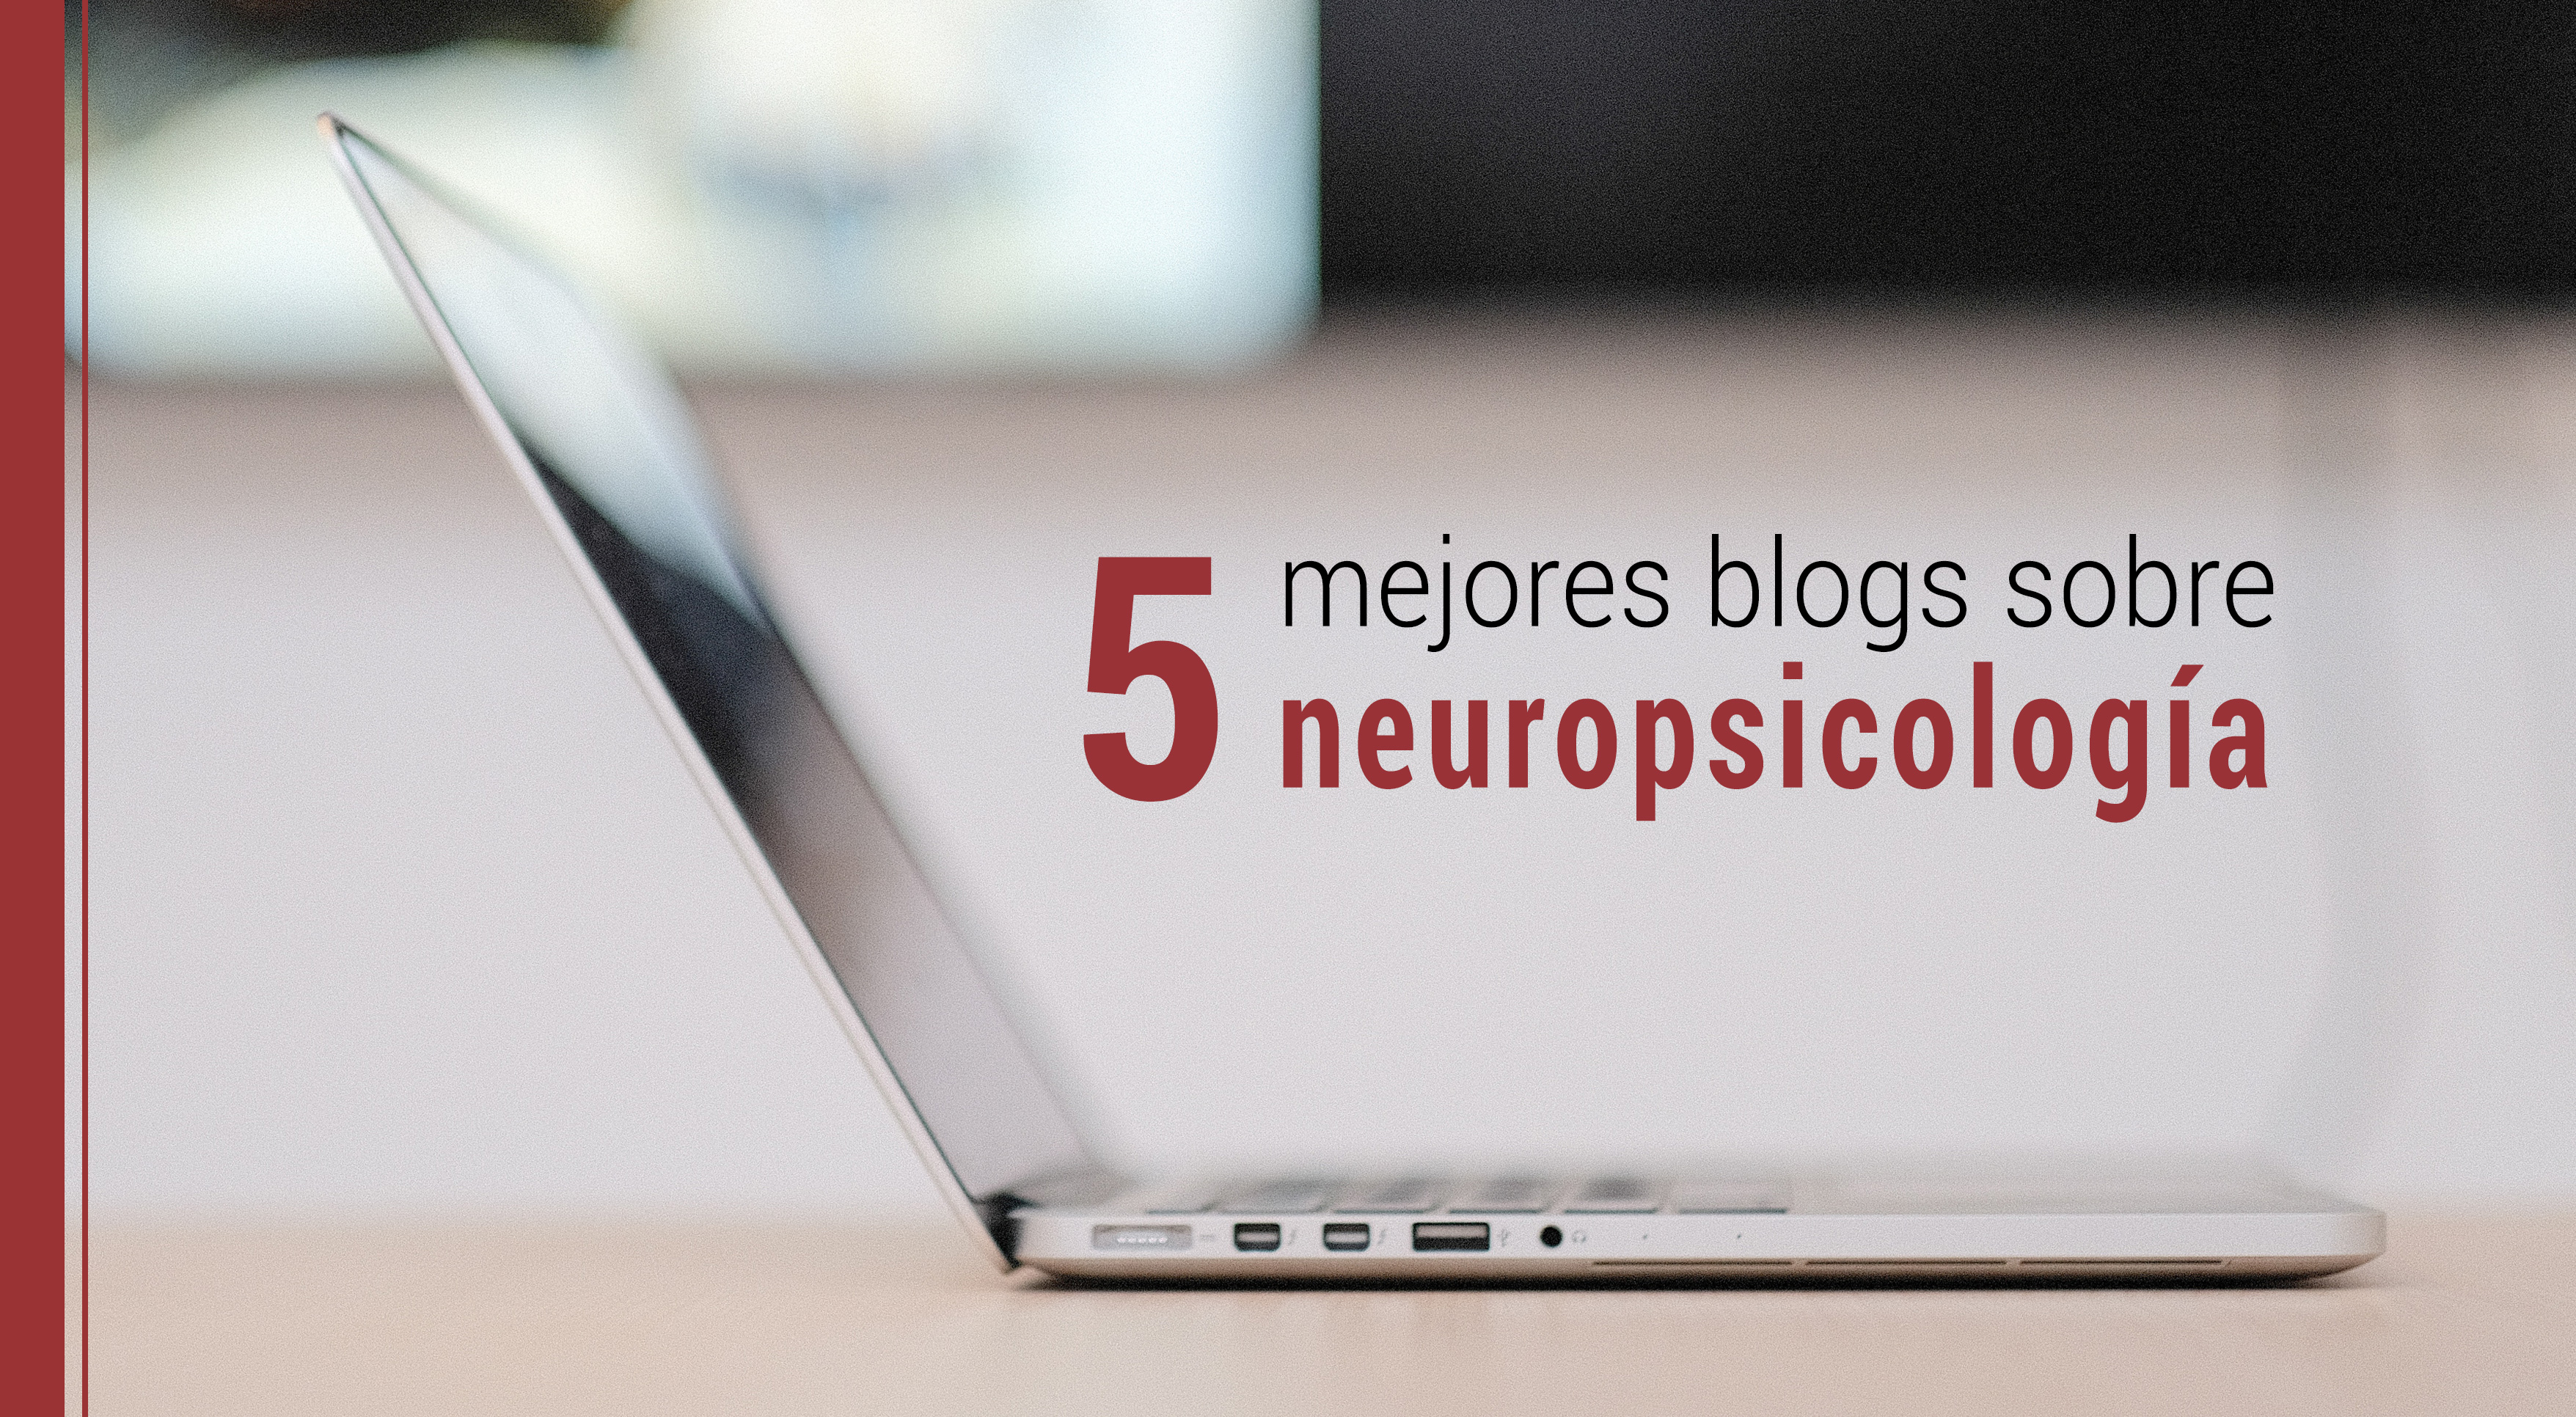 5-mejores-blogs-sobre-neuropsicologia 5 blogs imprescindibles sobre Neuropsicología